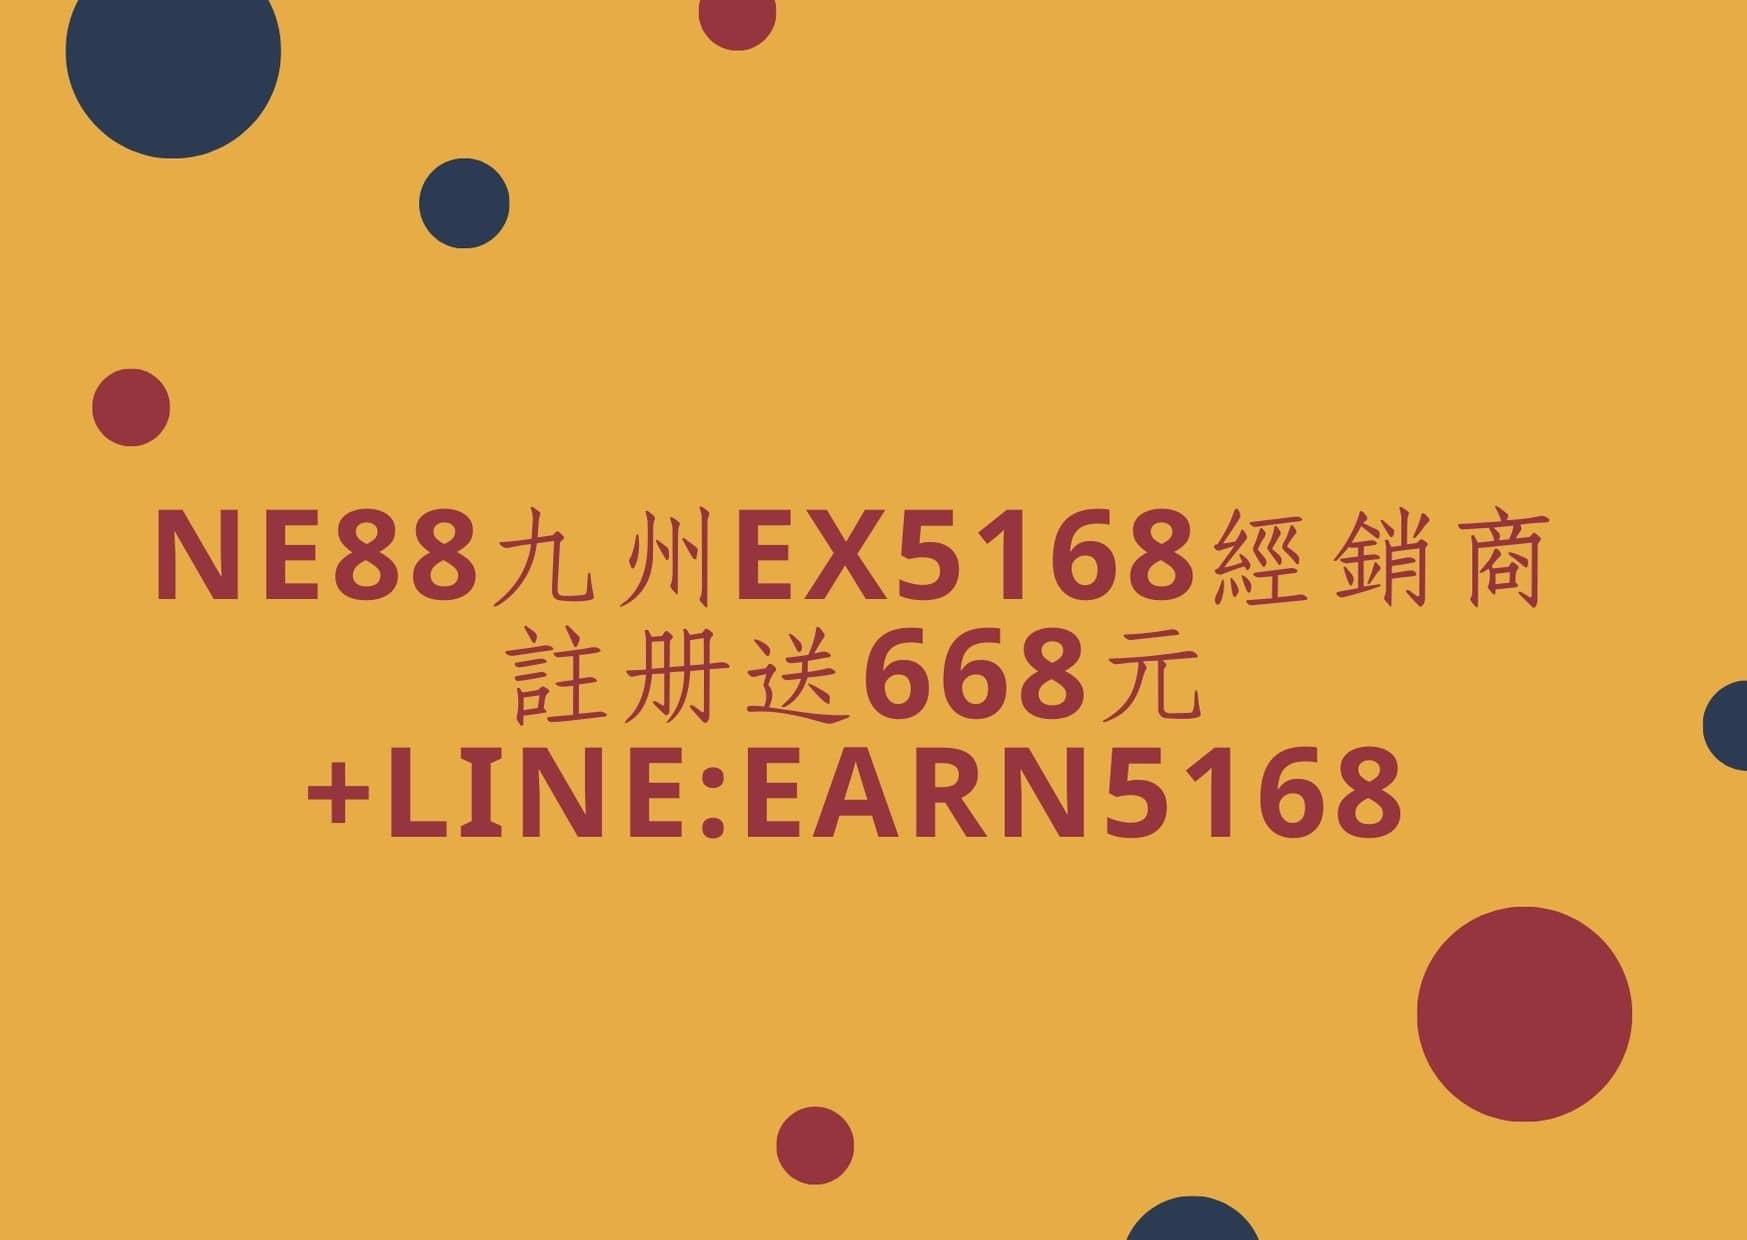 ne88九州EX5168經銷商|註冊送668元 +LINE:earn5168